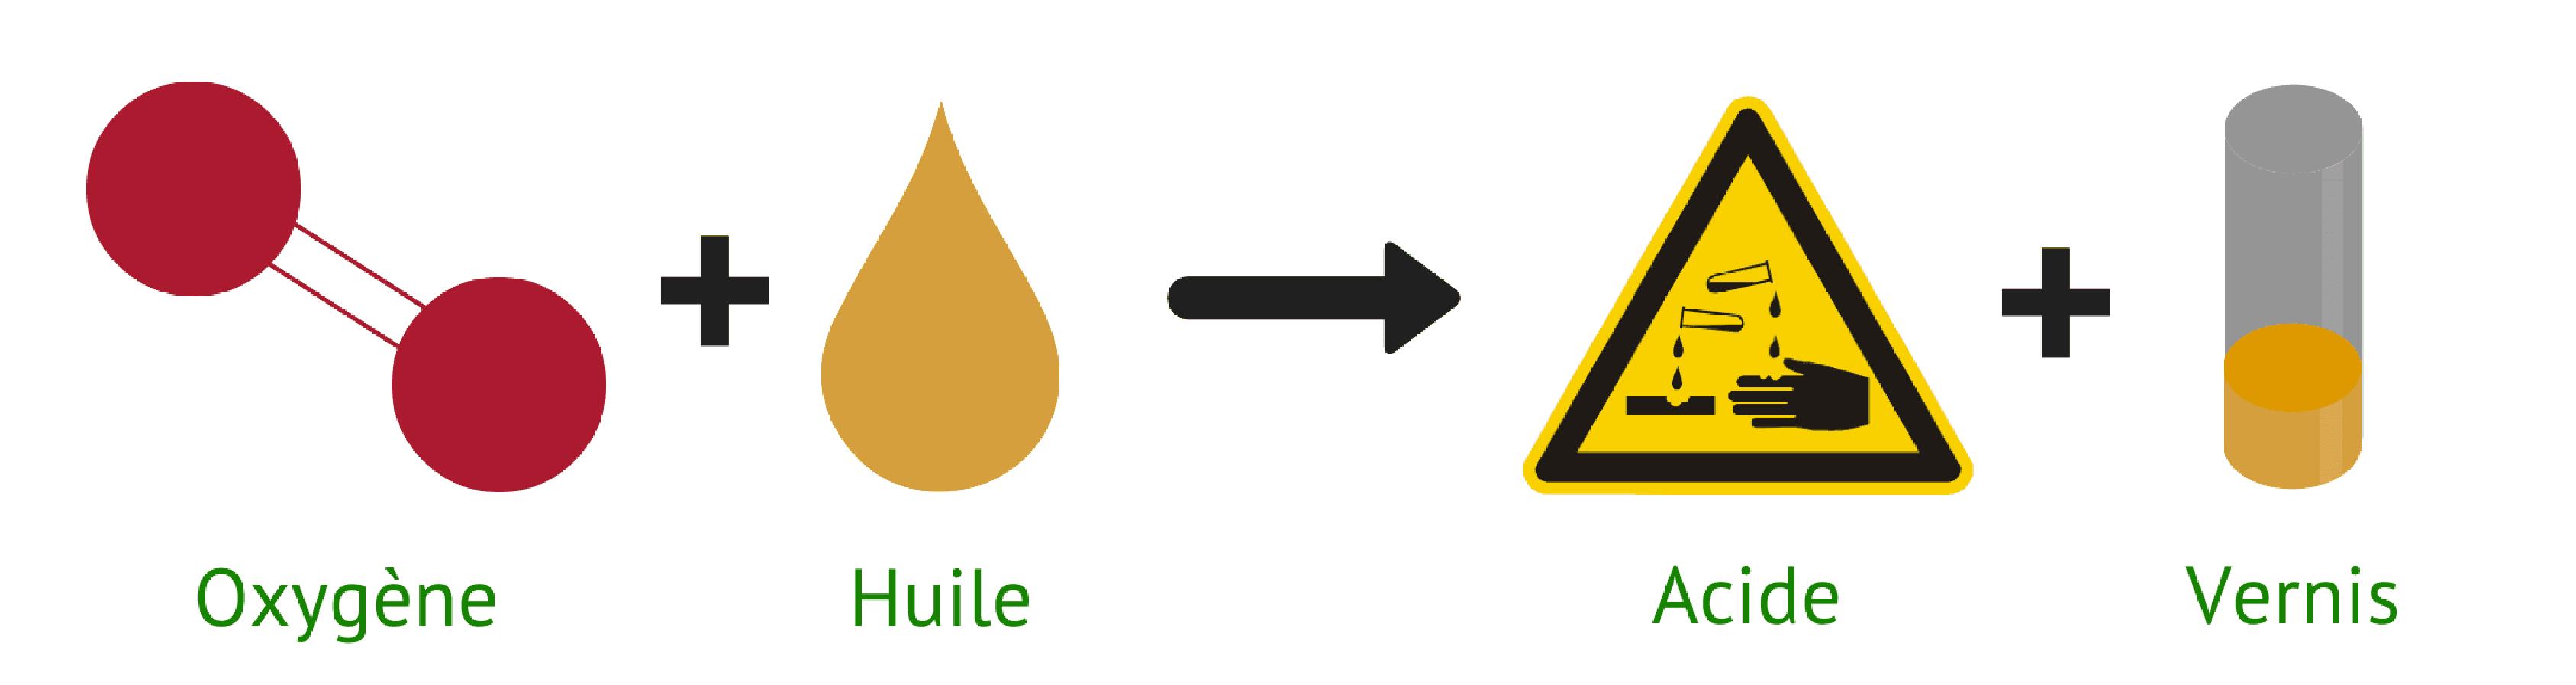 Oxygène + huile donne acide + vernis